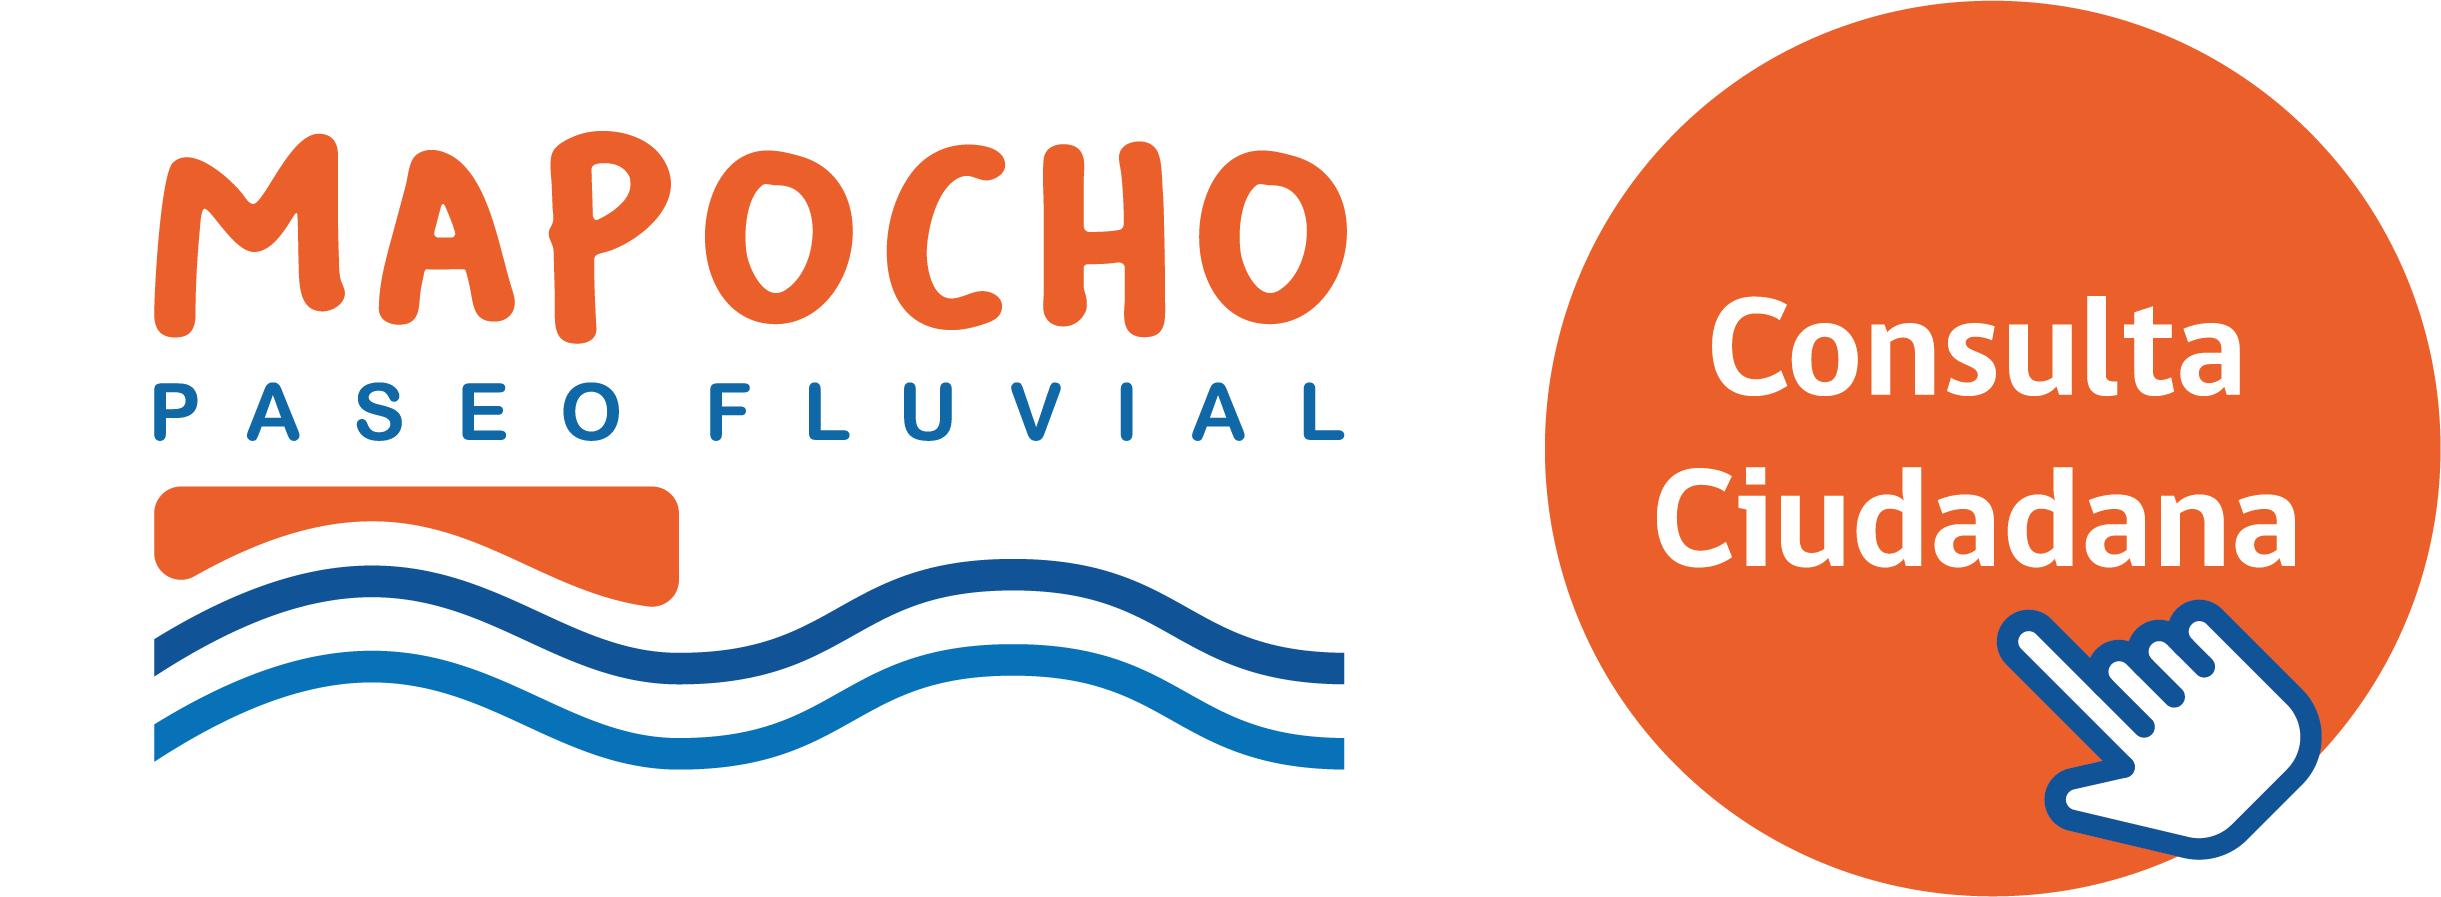 Mapocho Fluvial